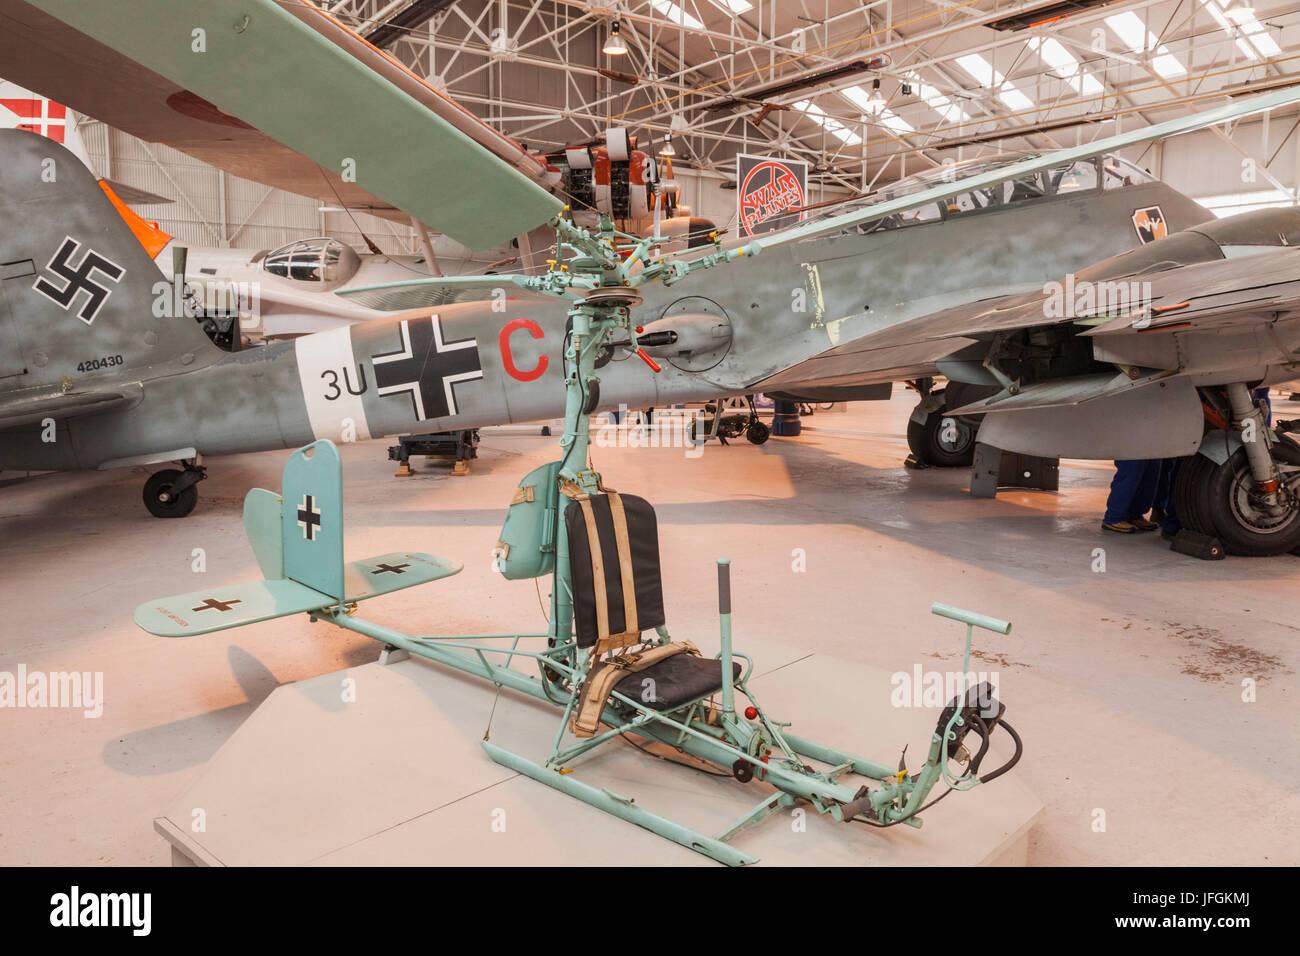 England, Shropshire, Royal Airforce Cosford Museum, FA-330 German Bachstelza Light Reconnaissance Plane - Stock Image